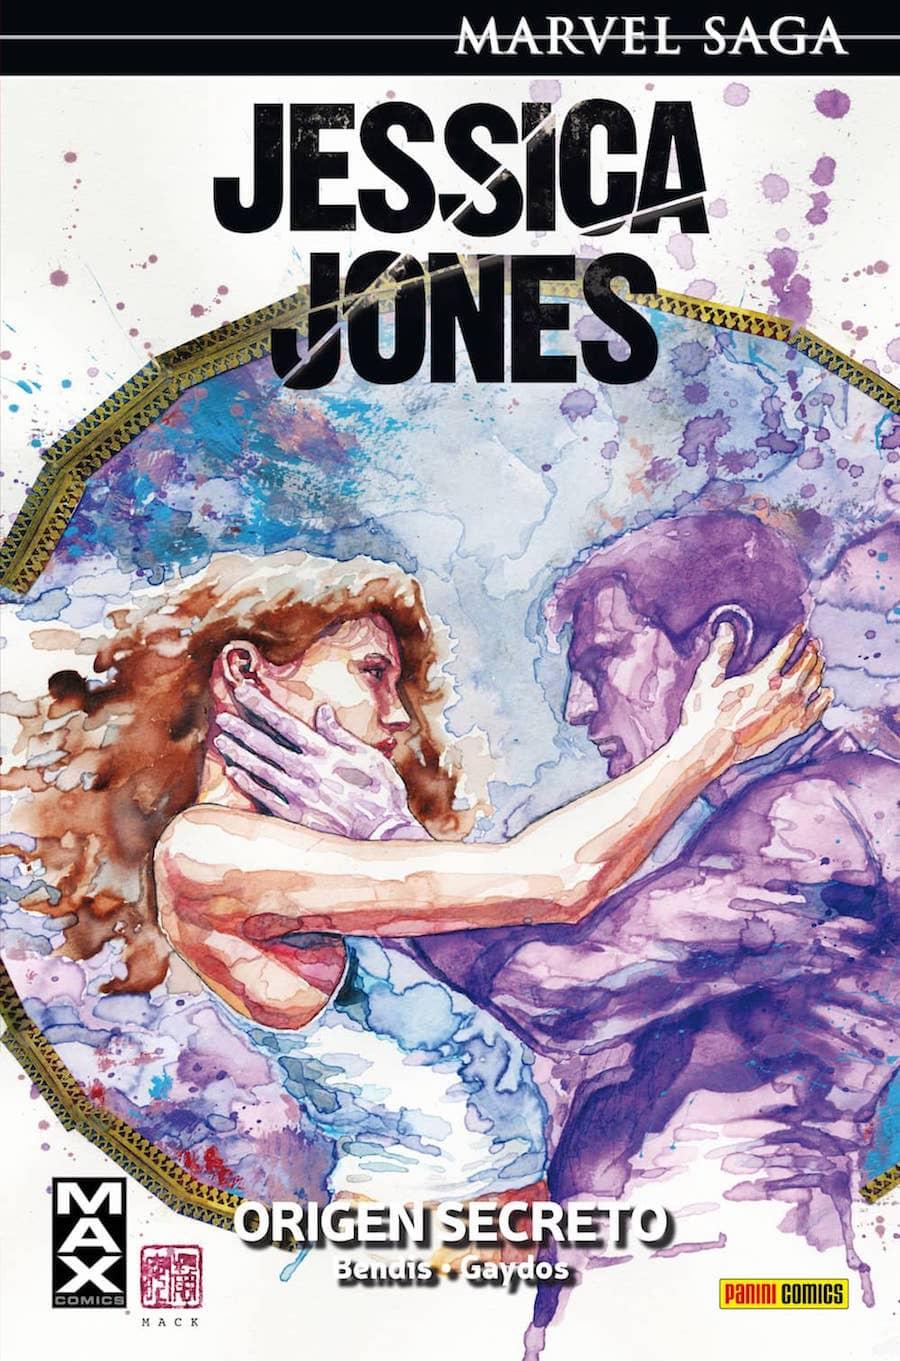 JESSICA JONES 04: ORIGEN SECRETO (MARVEL SAGA ...